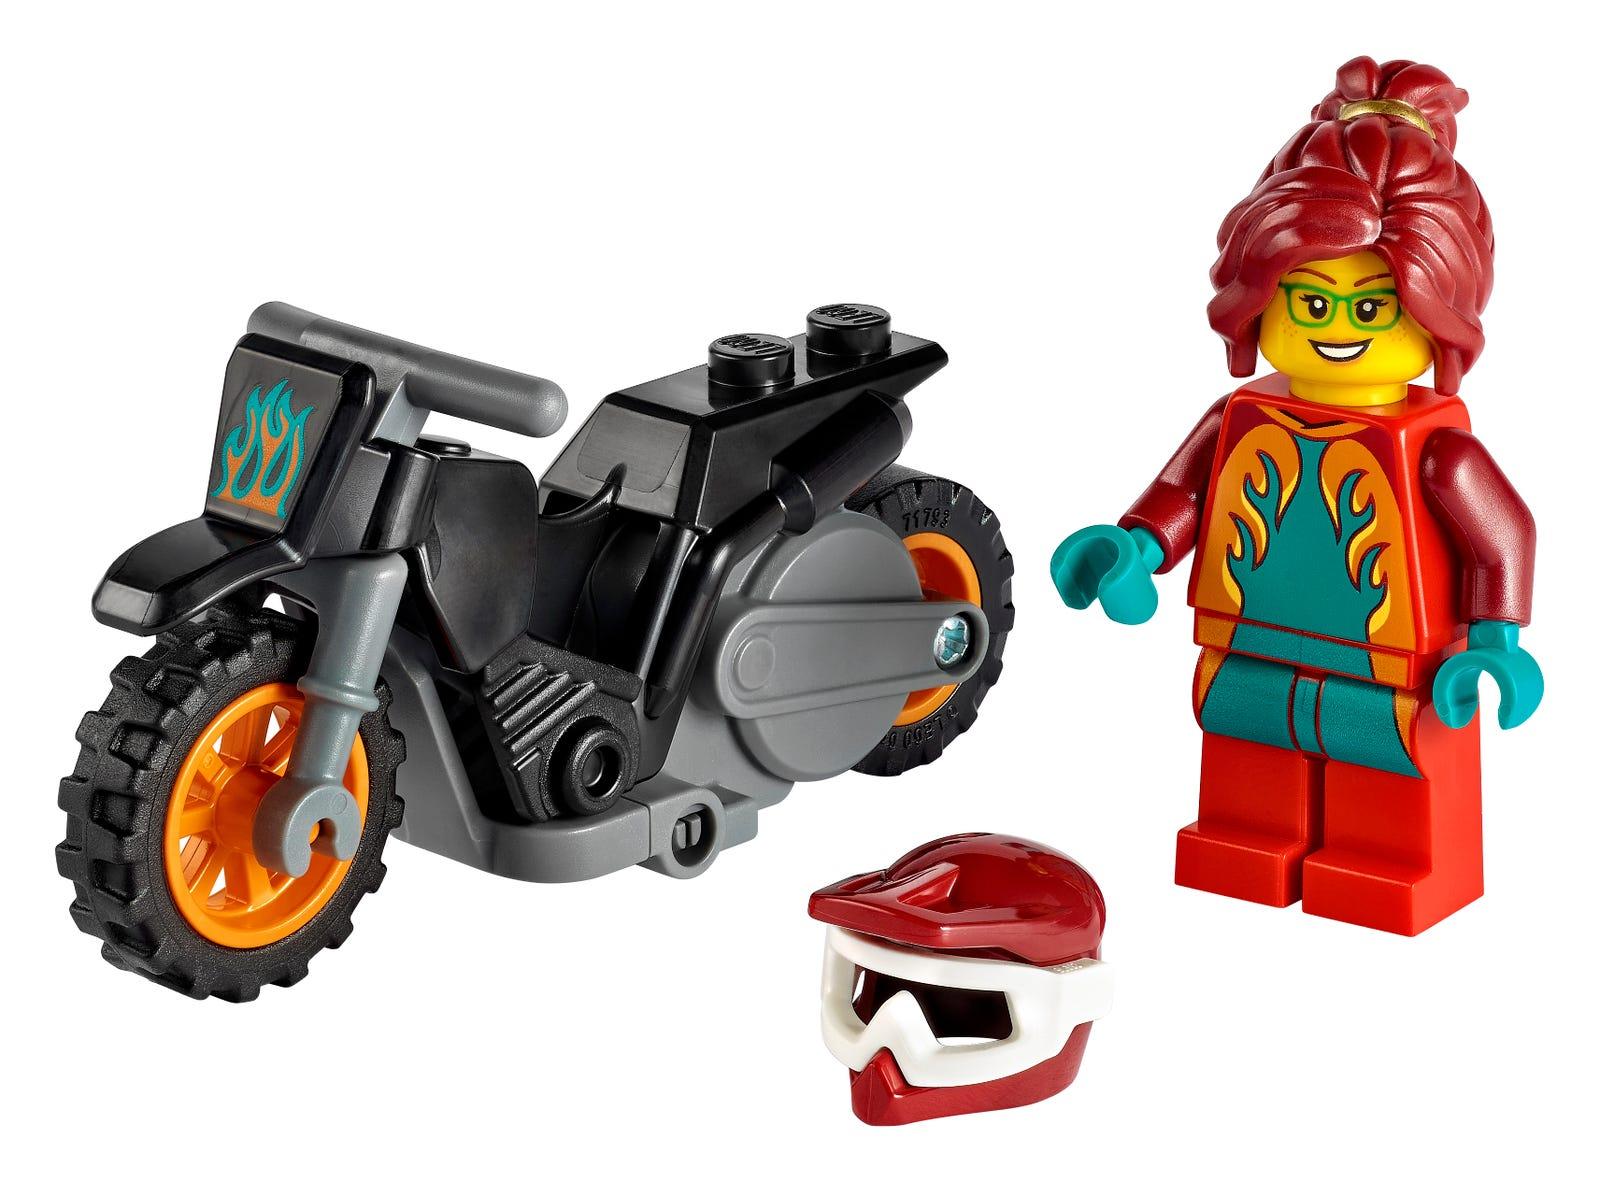 LEGO introduces flywheel-powered bikes with LEGO City Stuntz sets 26